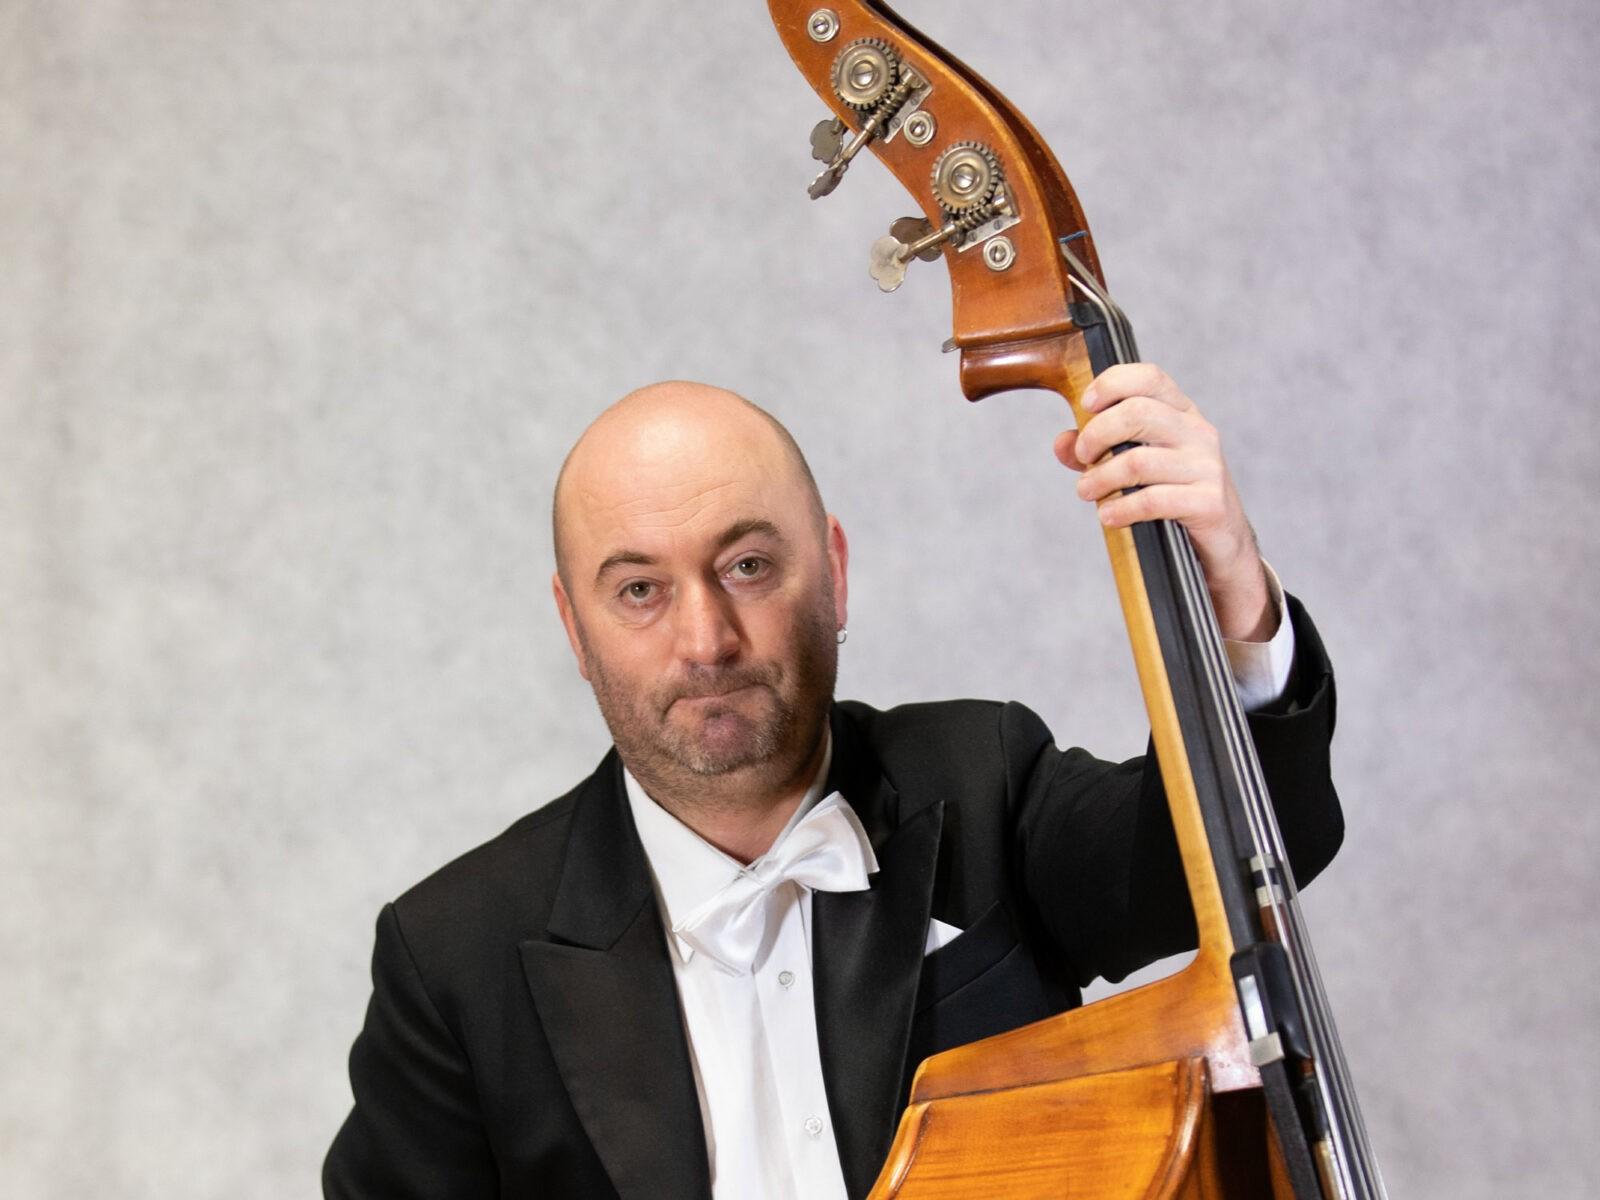 Robert Brzozowski